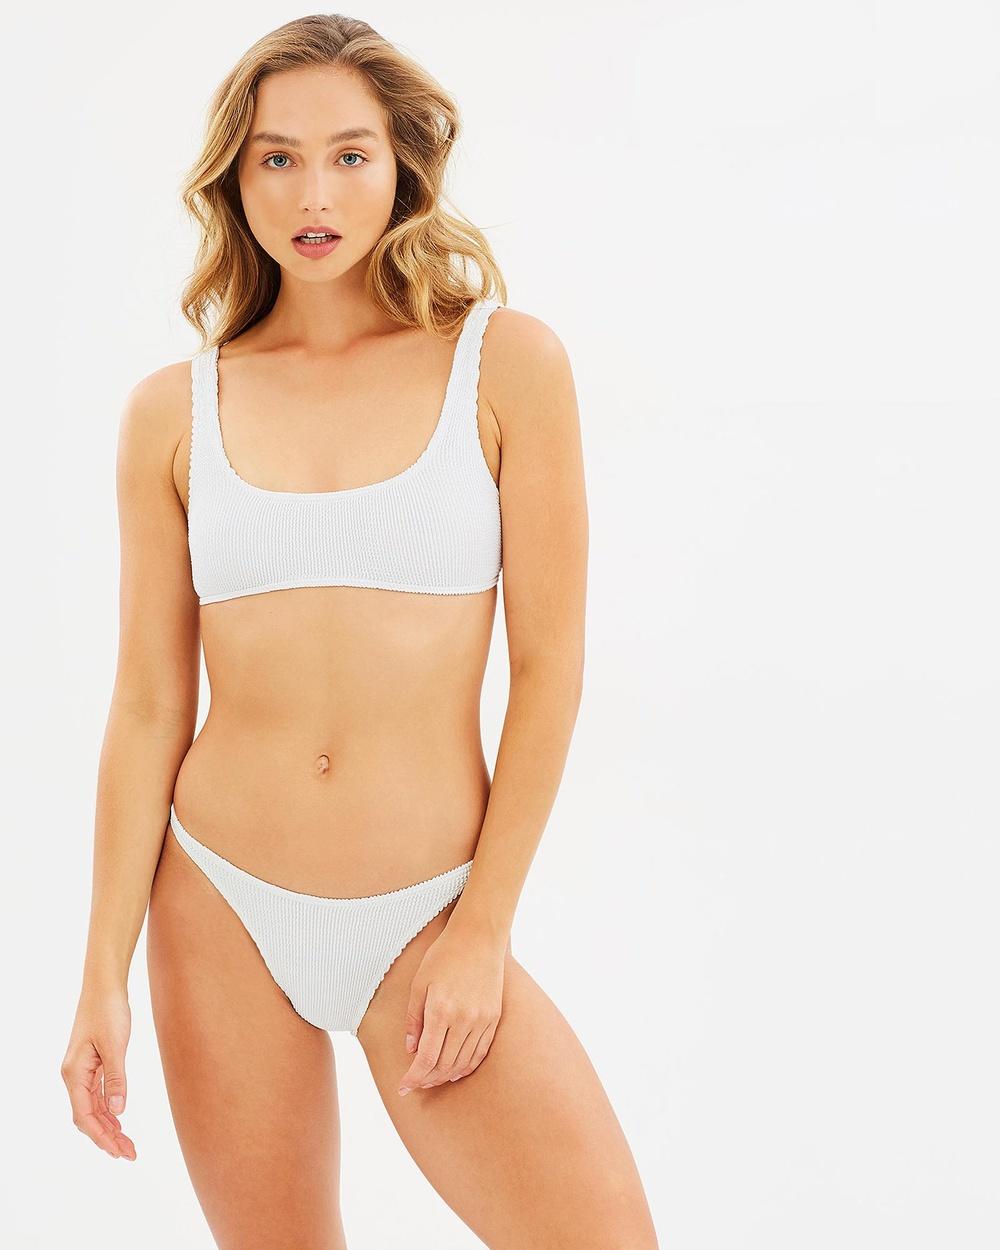 BOUND by Bond-Eye Australia The Malibu Bikini Set Optic White The Malibu